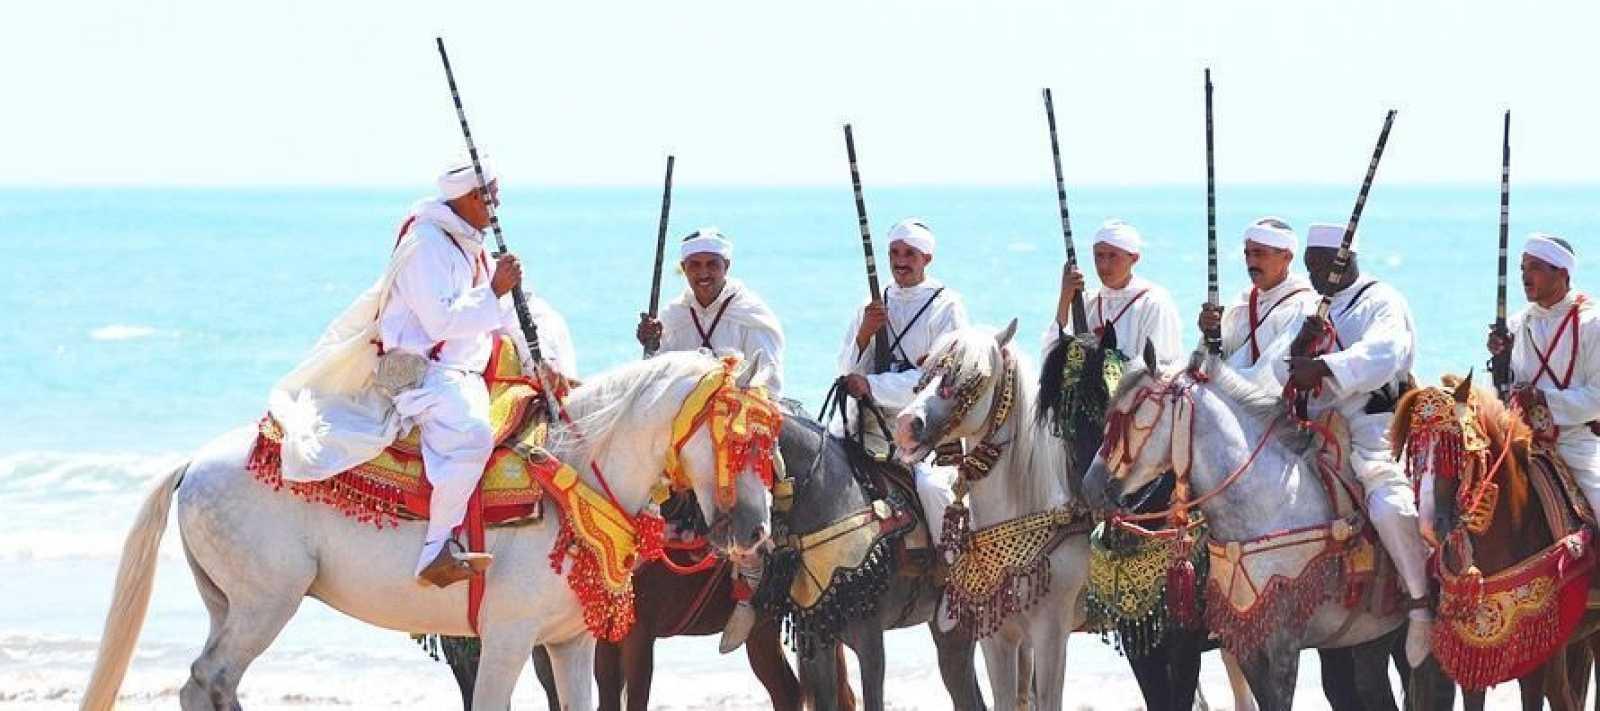 Mediterráneo - Jawad Amazigh. De Tinghir a Essaouira - 20/09/20 - escuchar ahora